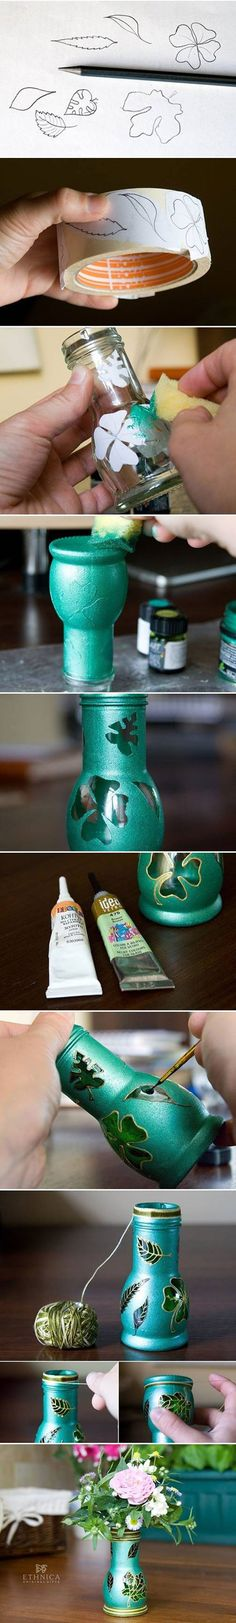 Handmade vase design -Tutorial